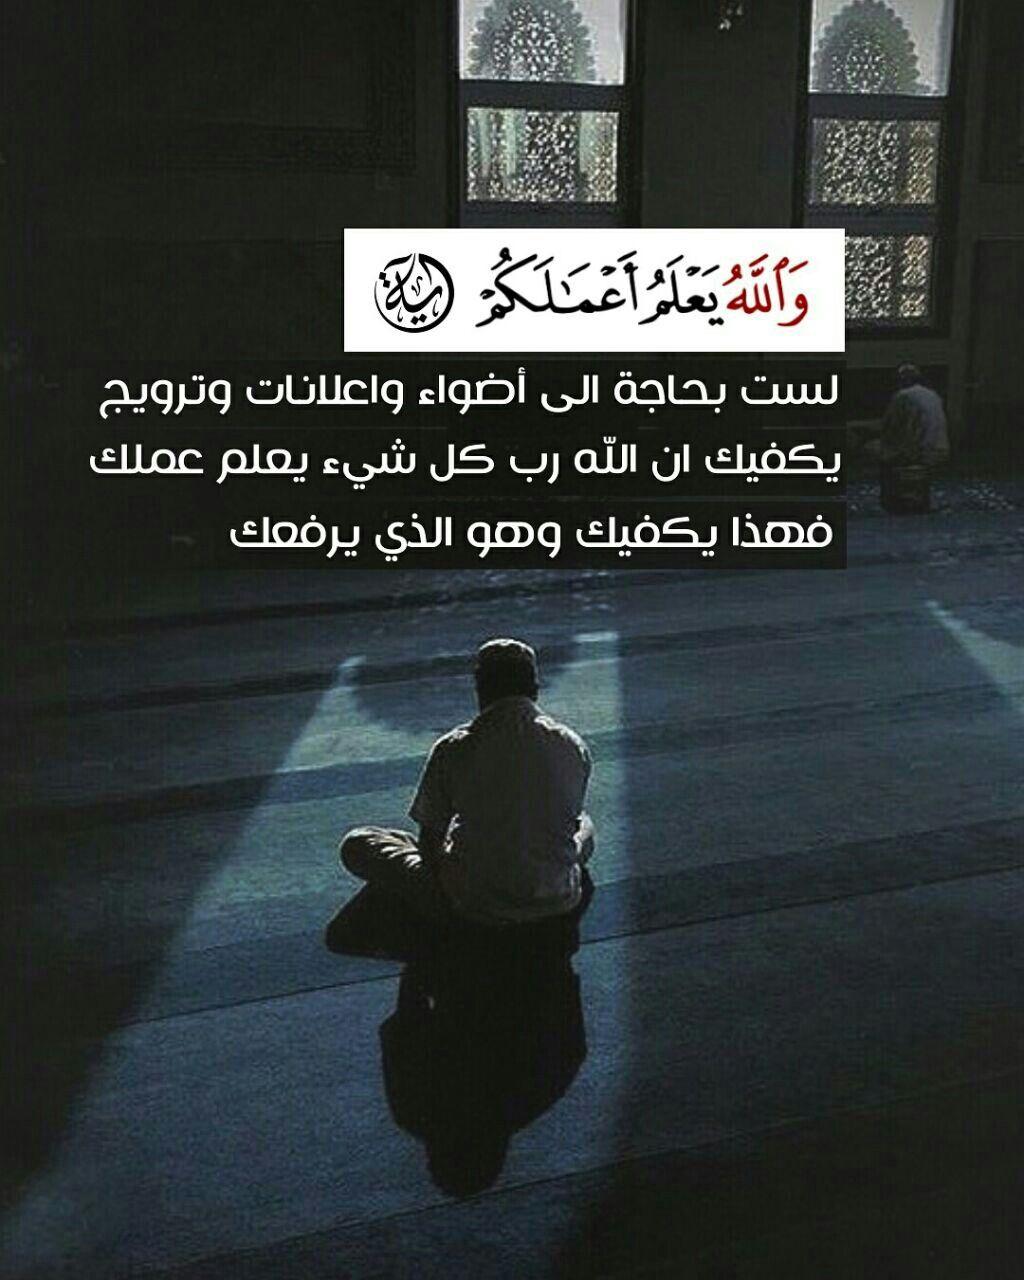 Pin By Zakori On اسلام Quran Quotes Quran Quotes Verses Quran Verses